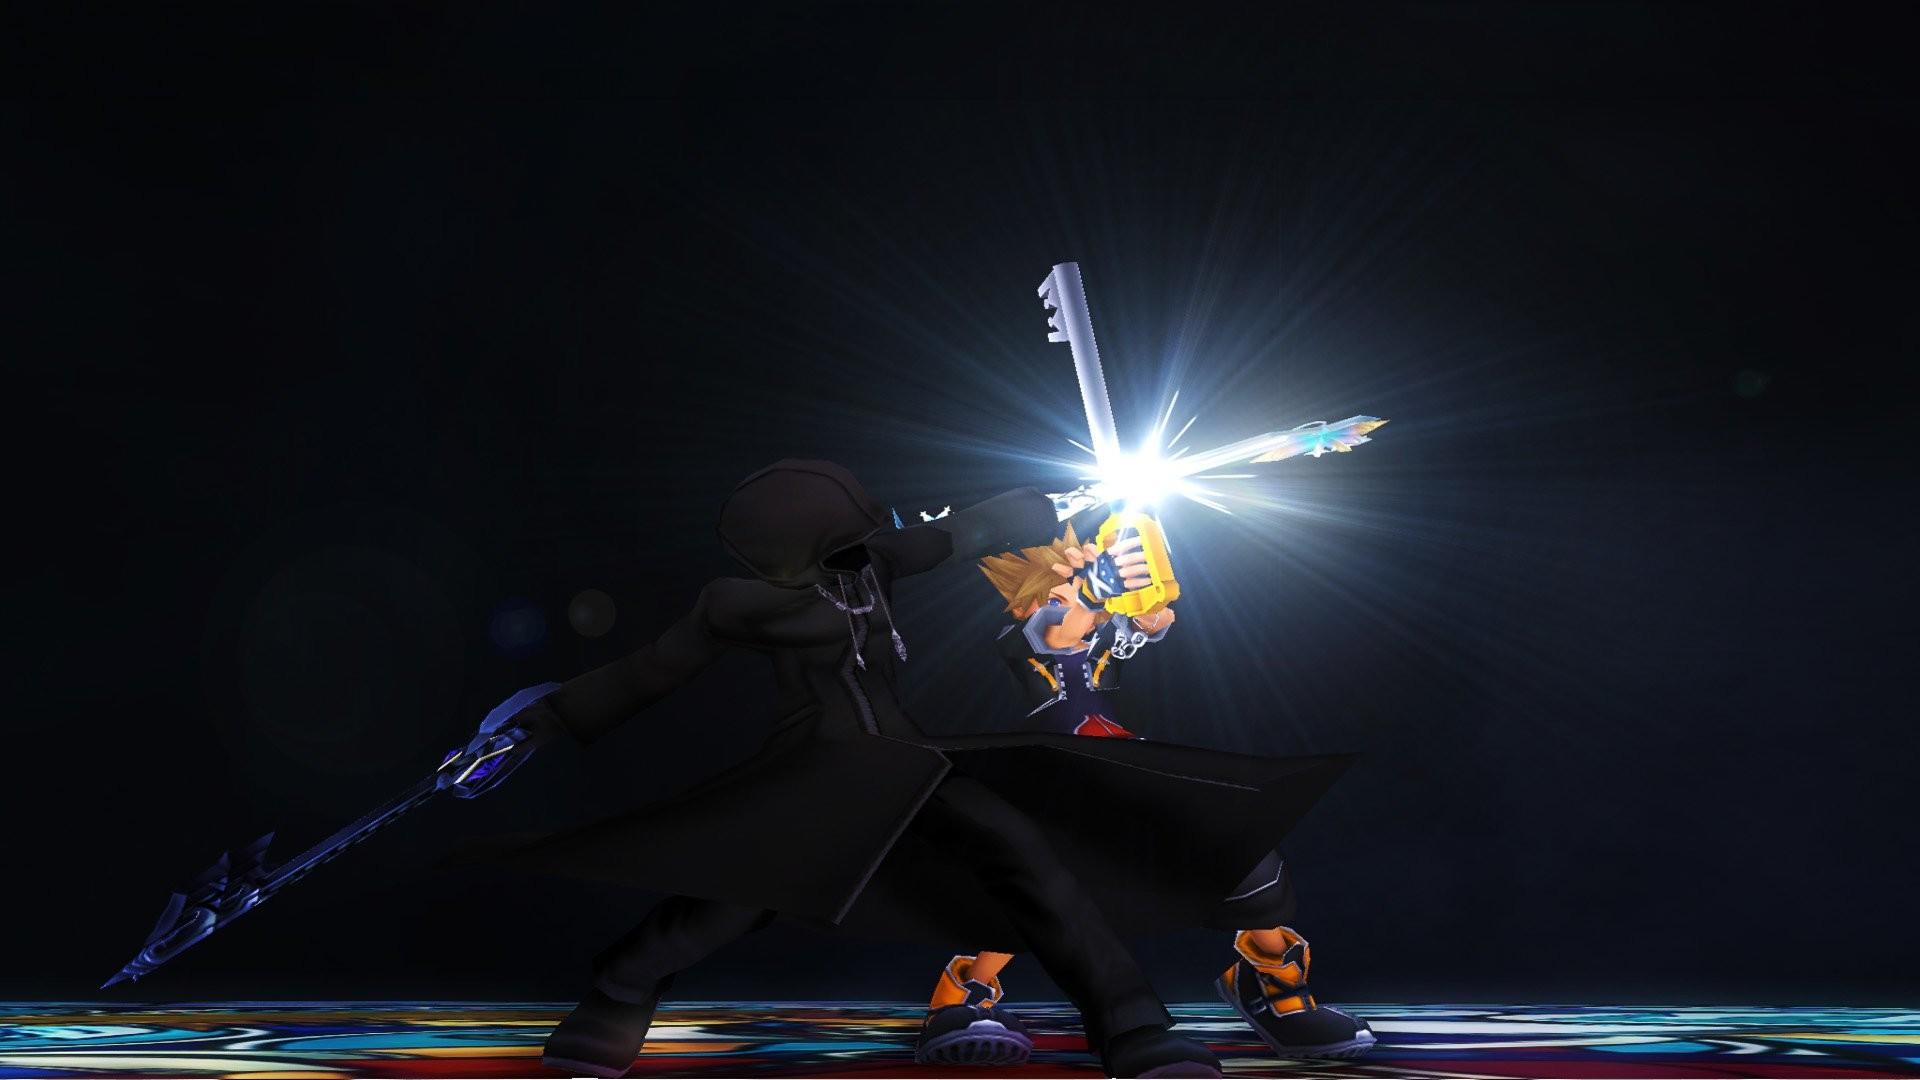 Anime Kingdom Hearts · HD Wallpaper | Background ID:204179